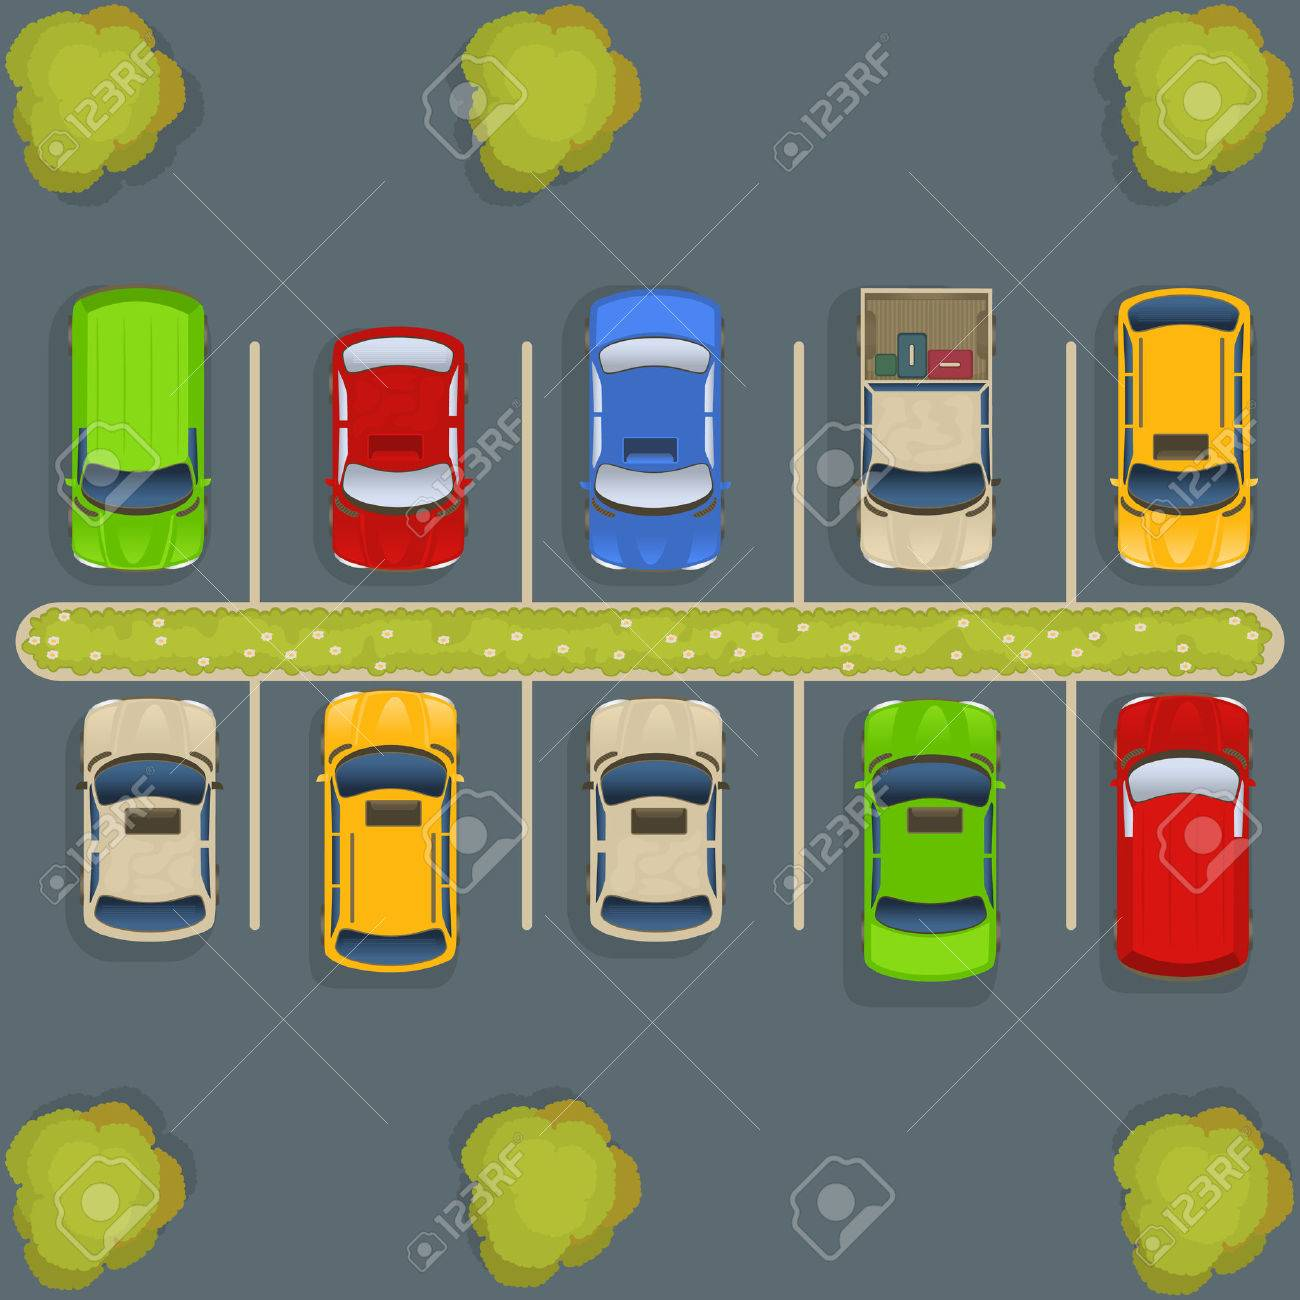 Parking lot top view - 56308379